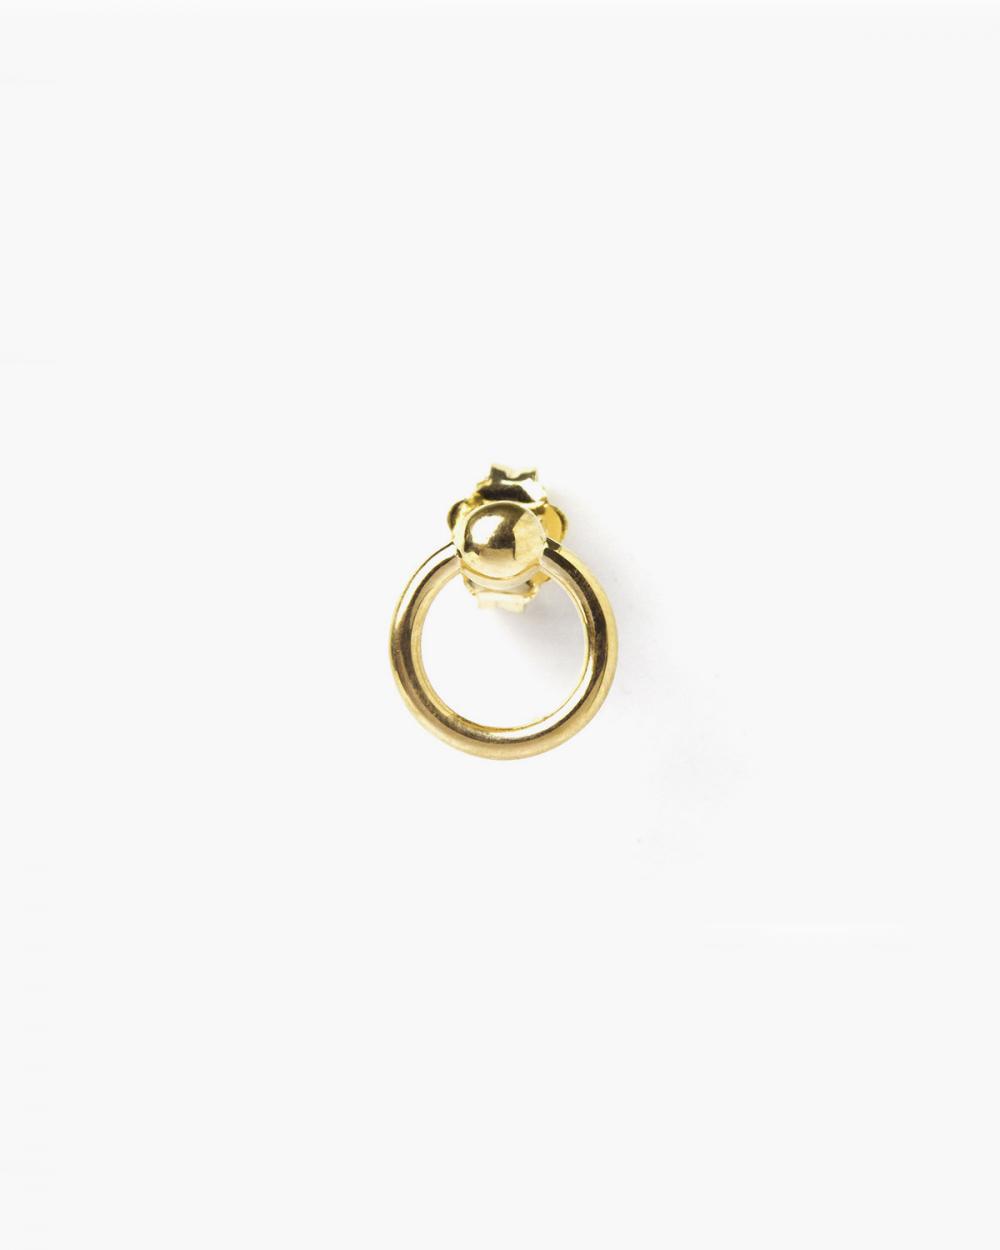 Piercing YELLOW GOLD PIERCING SMALL LOBE SINGLE EARRING NOVE25